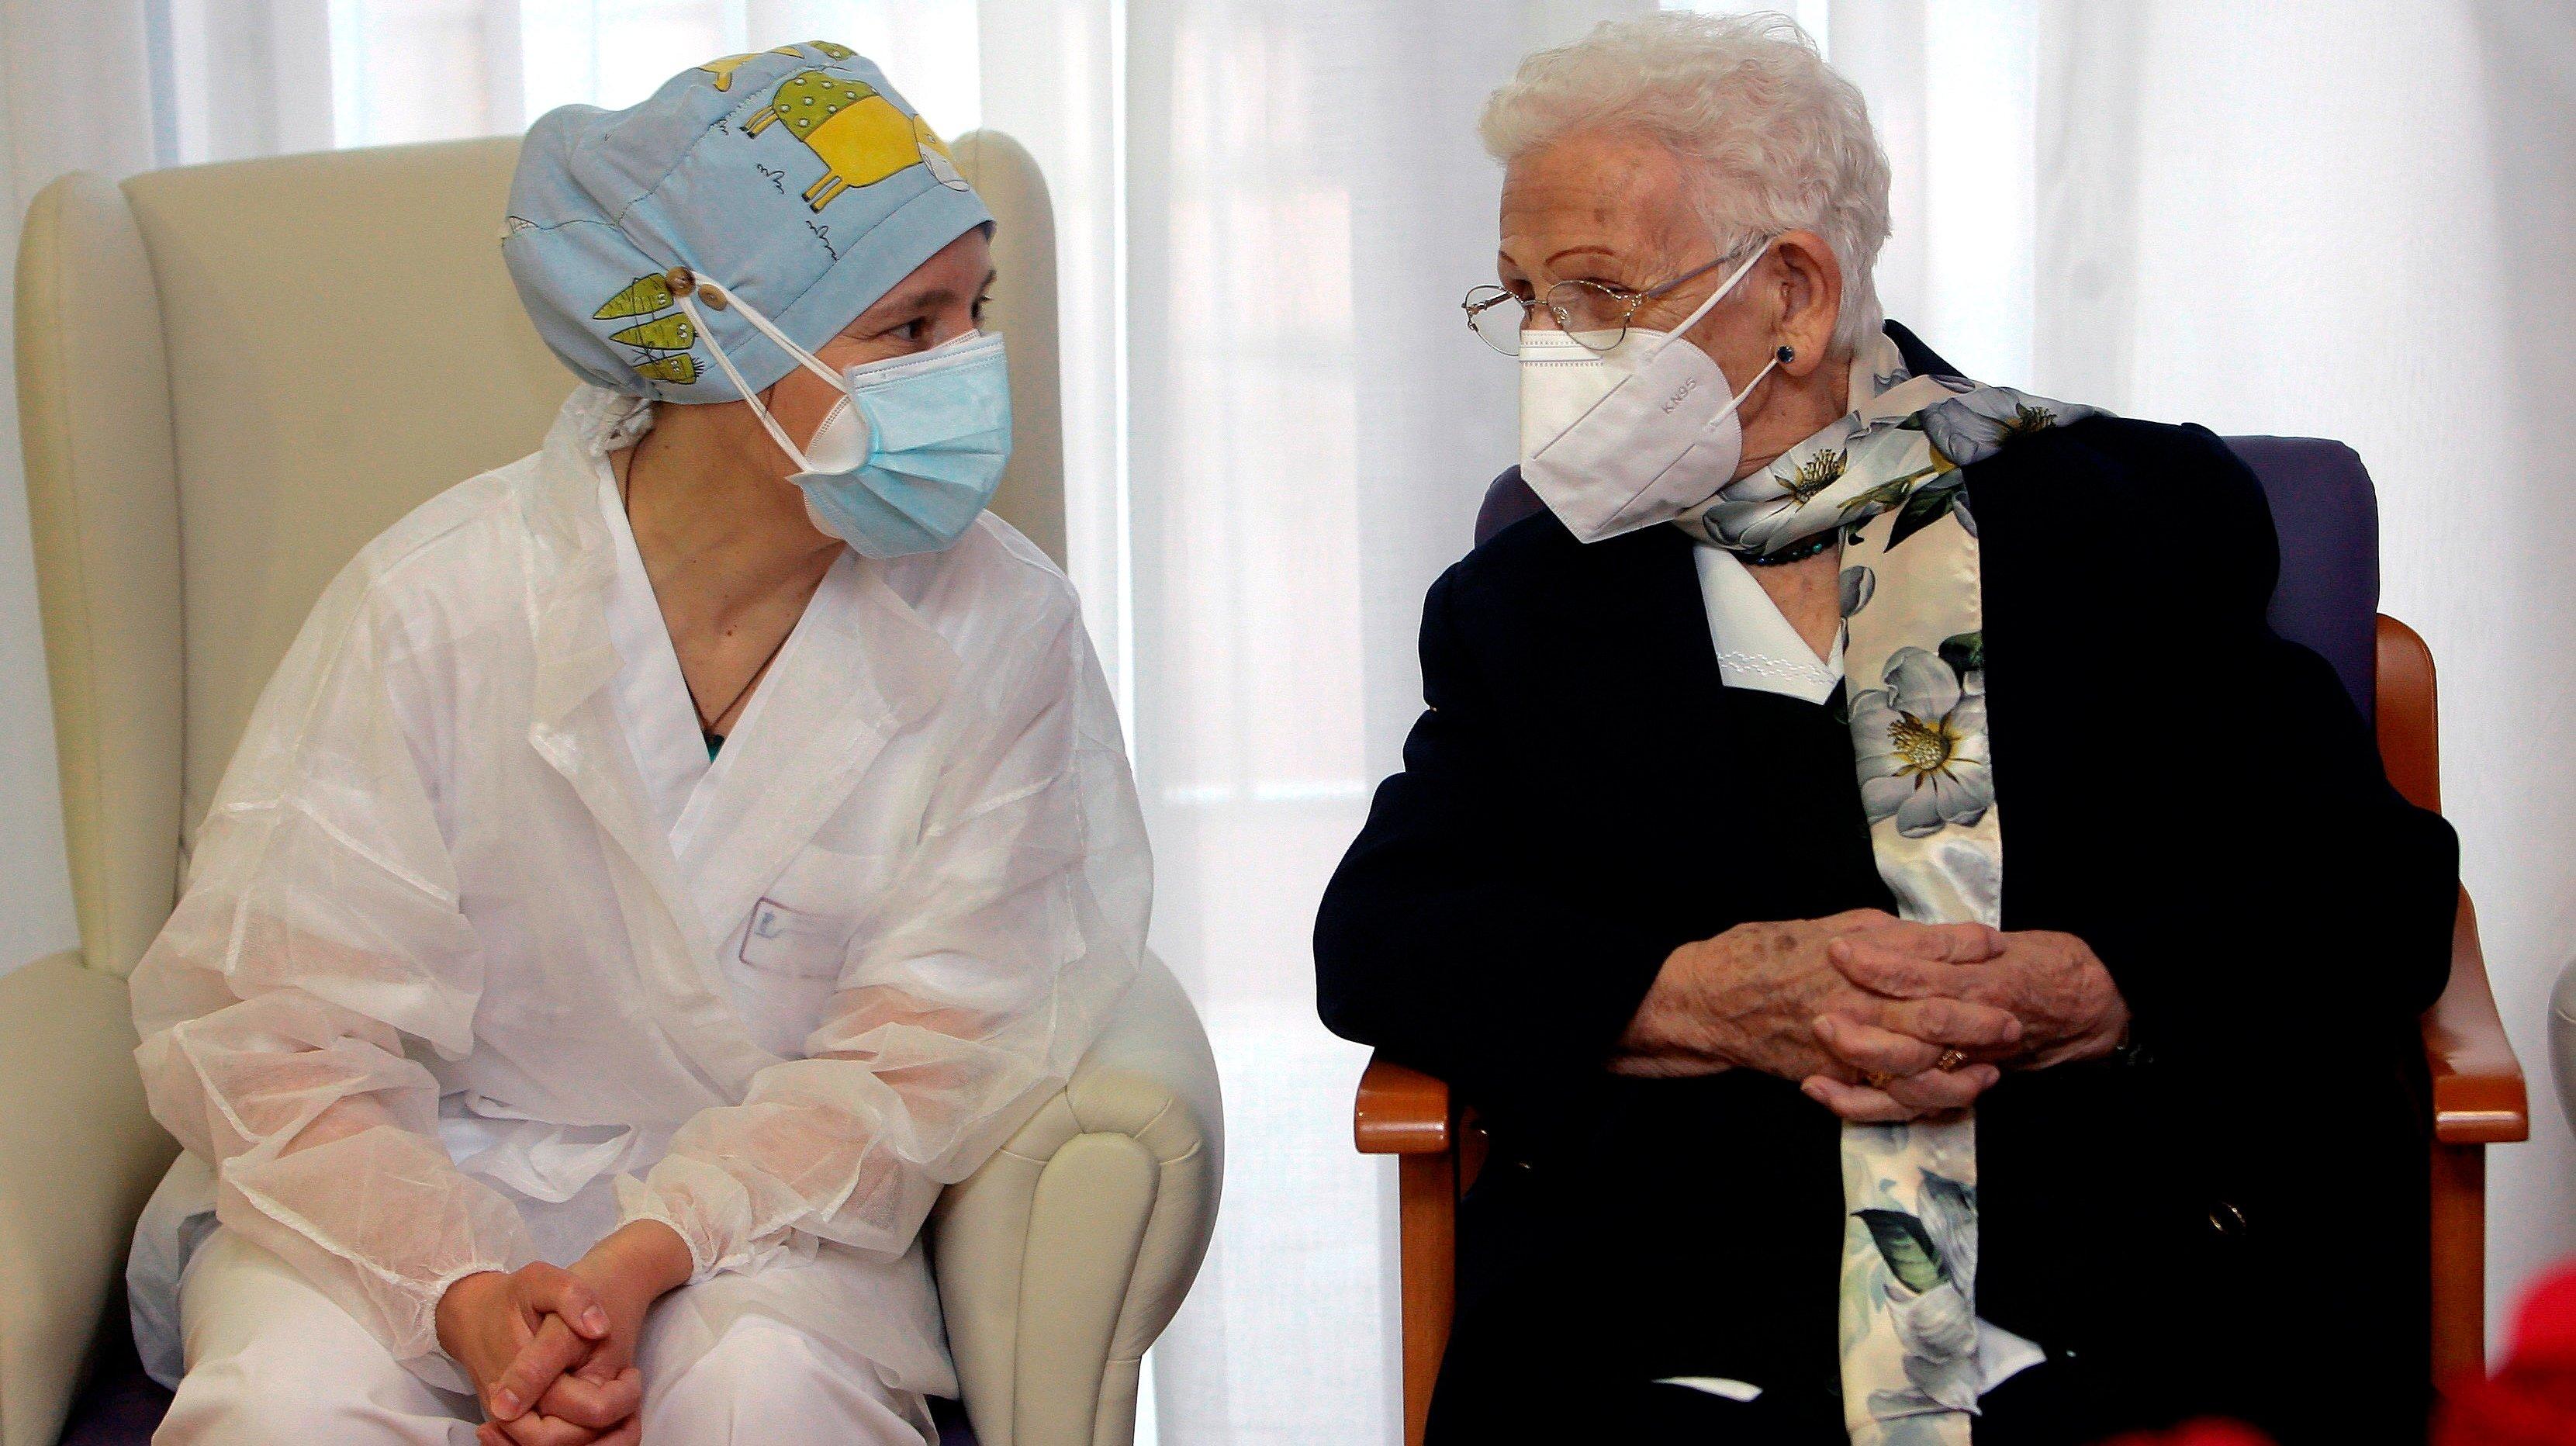 SPAIN-HEALTH-VIRUS-VACCINE